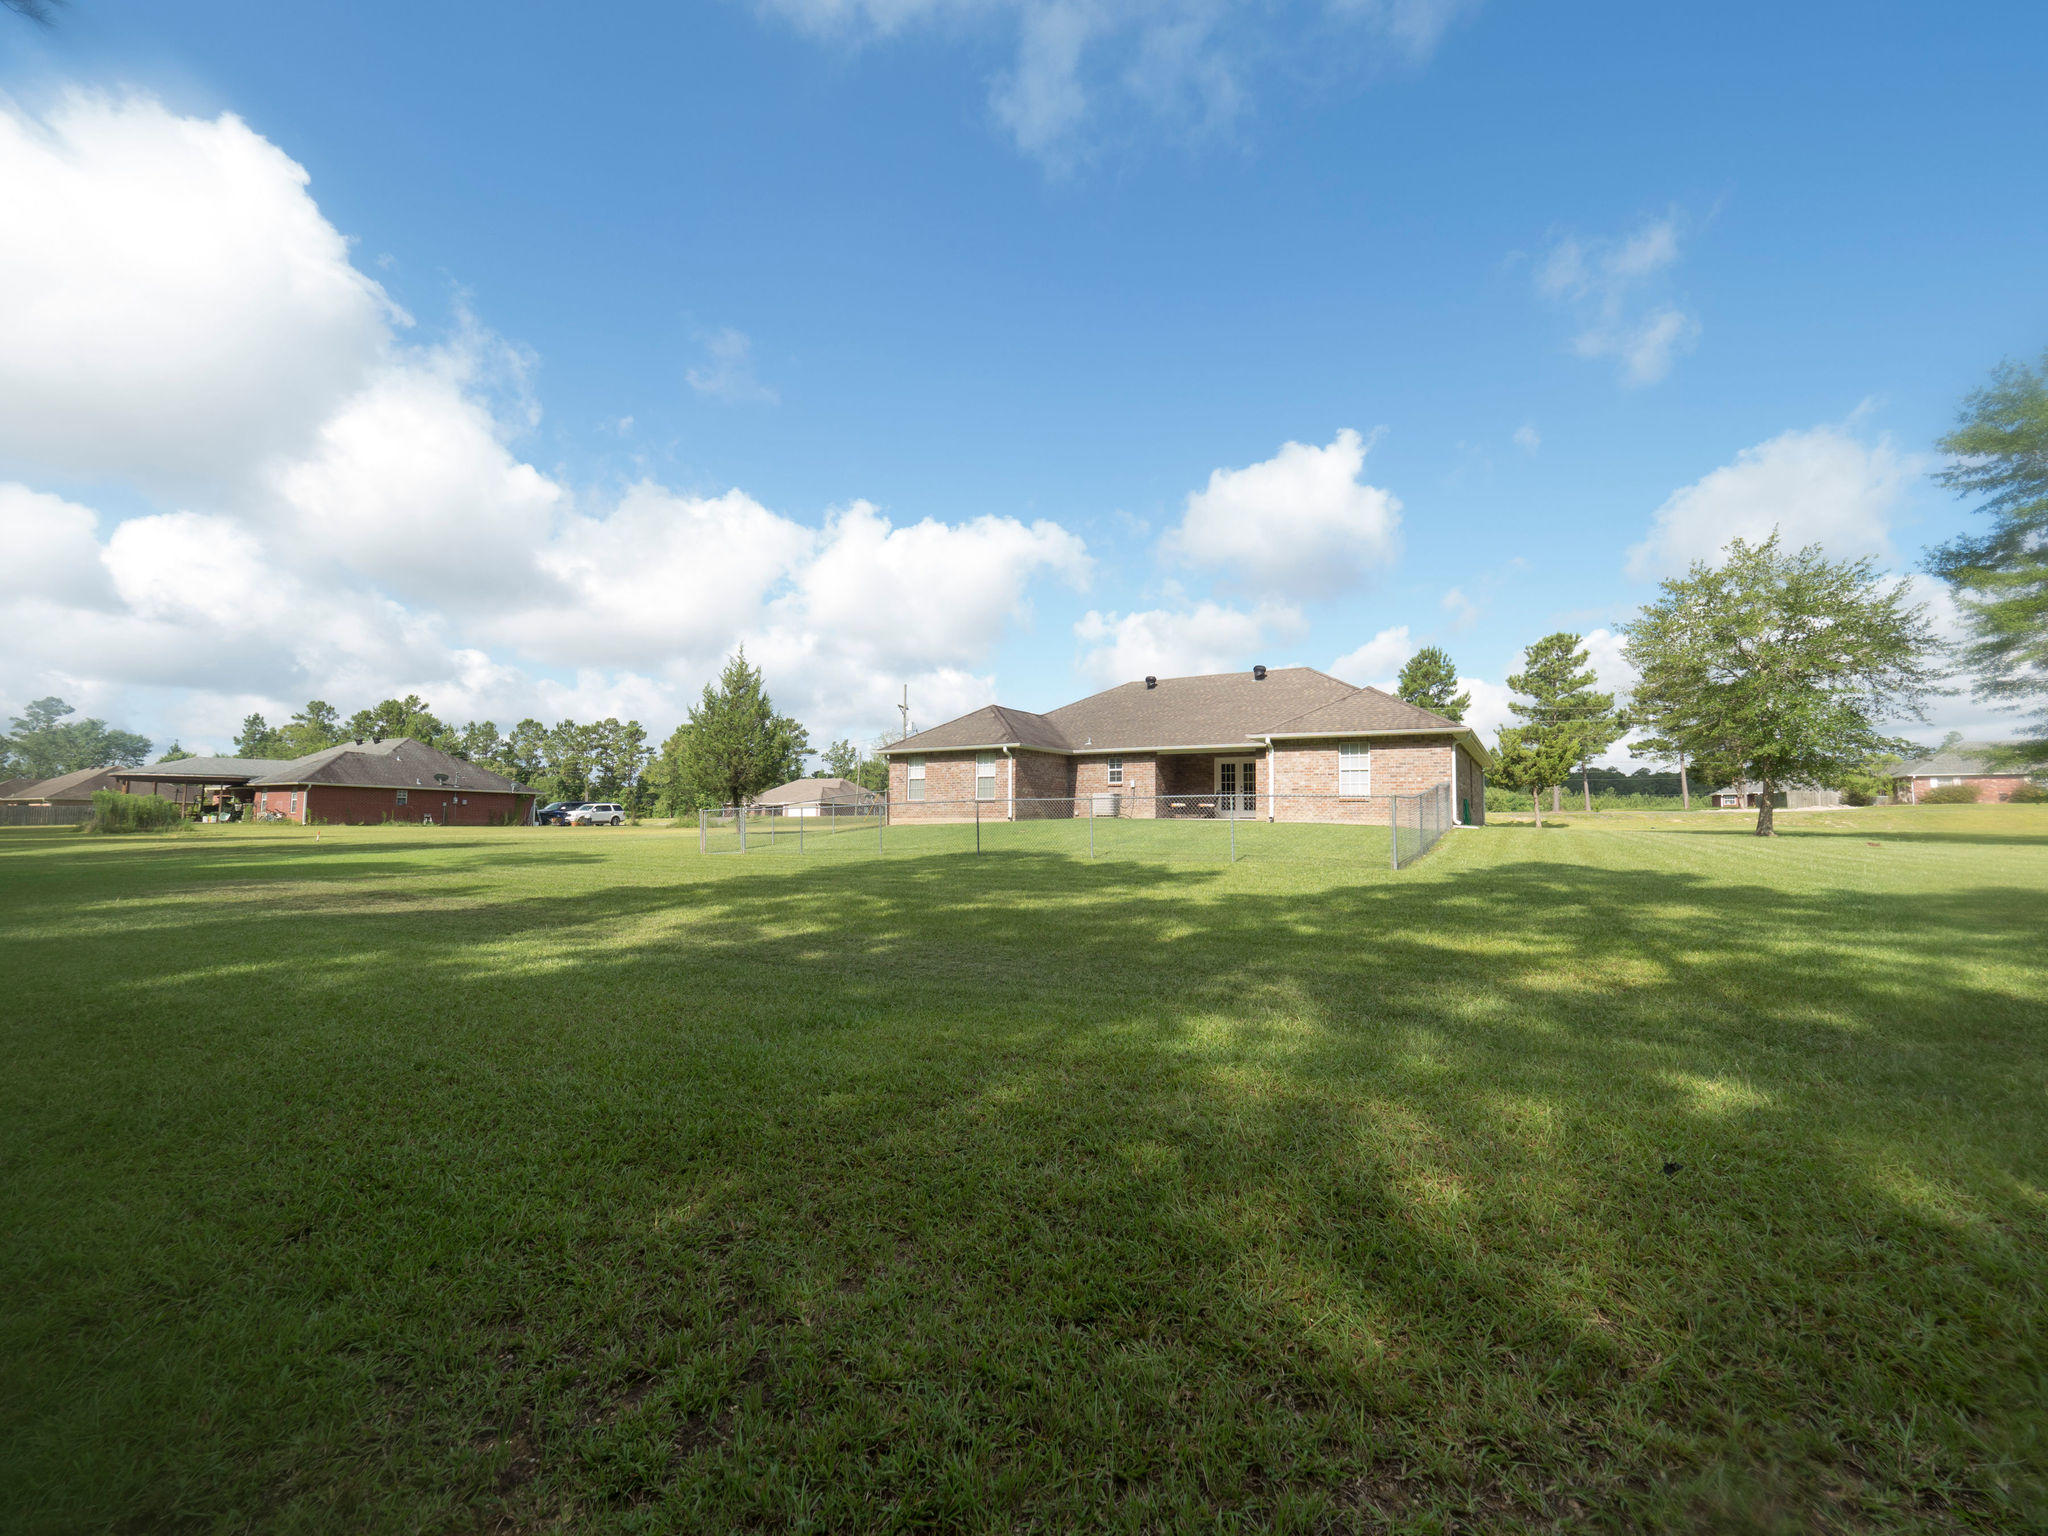 Leesville home for sale, 106 Will Dr, Leesville LA - $178,000